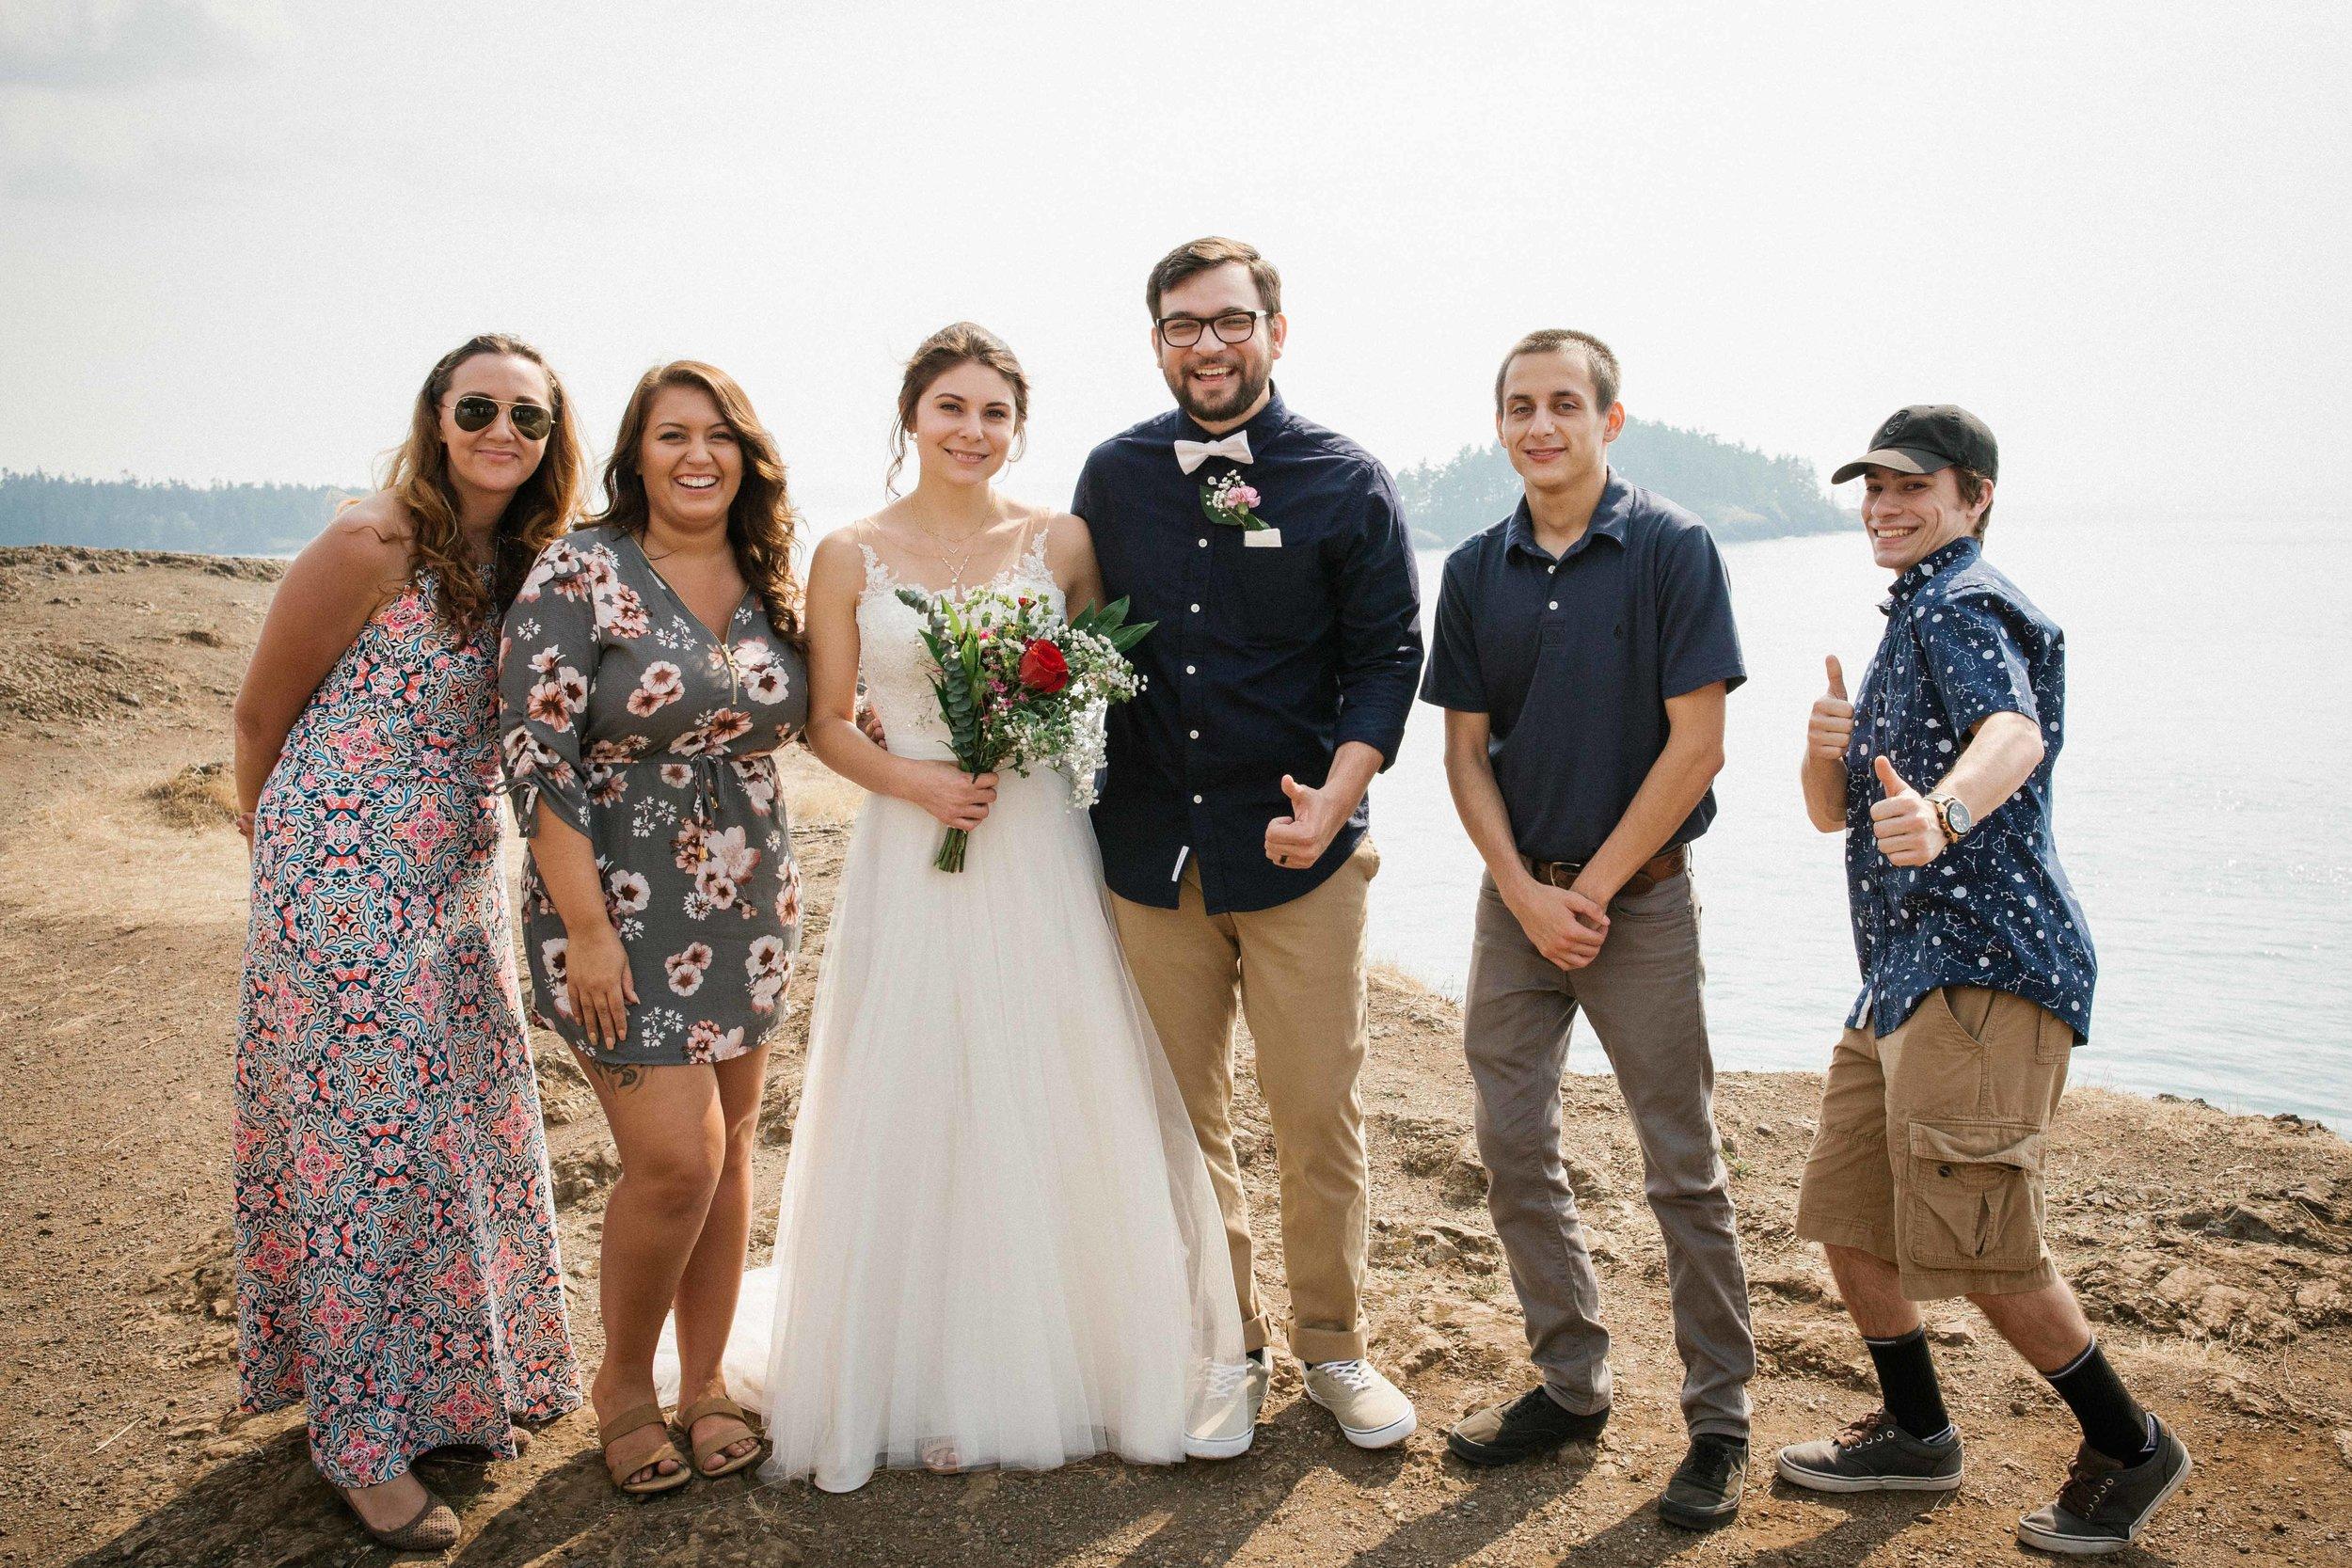 deception-pass-wedding-40.jpg